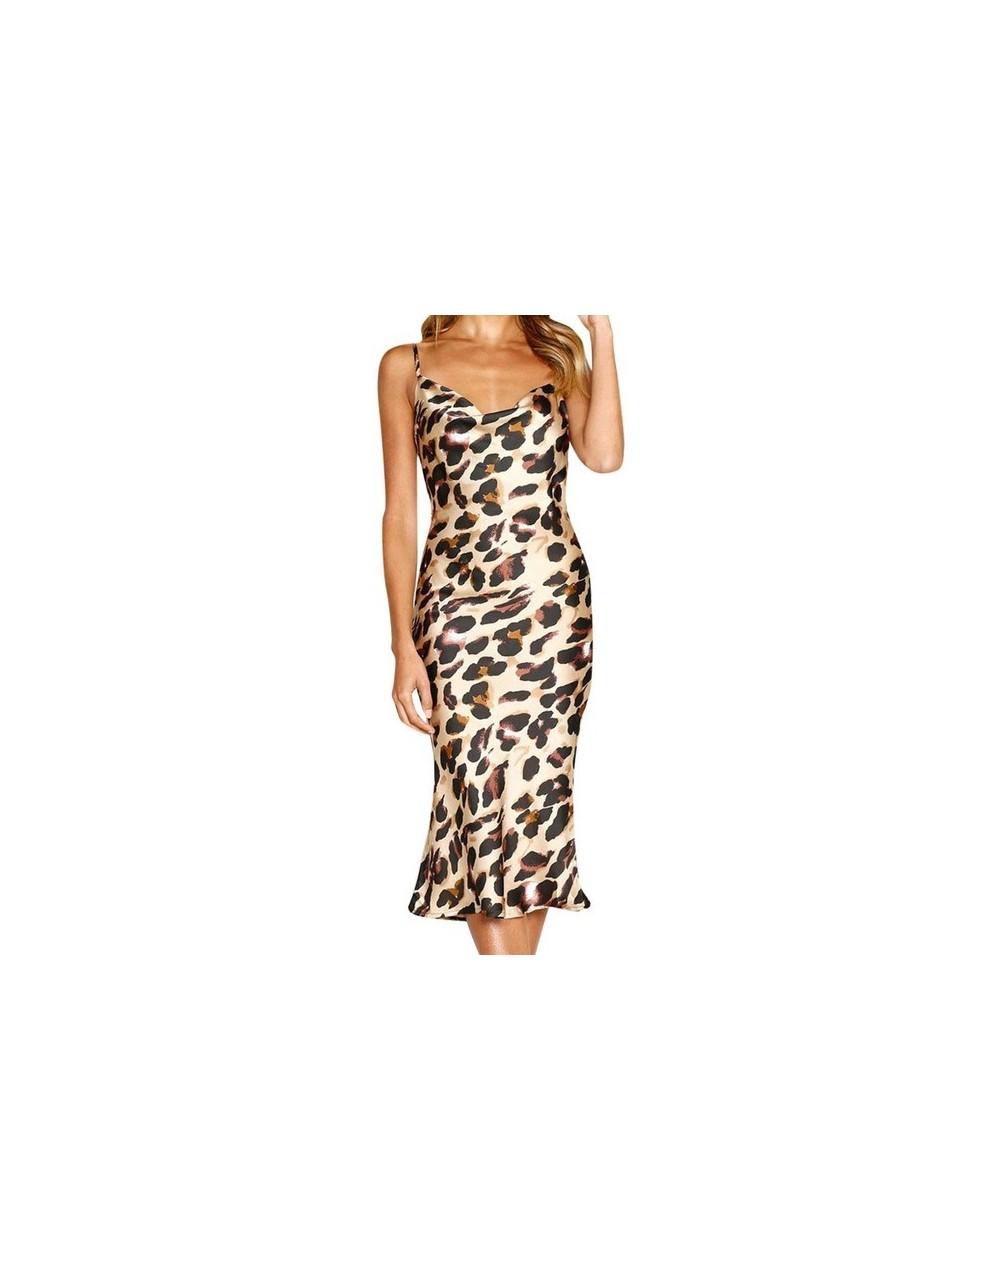 Summer Satin Dress Women Green Pink Black Spaghetti Strap Backless Sexy Midi Party Night Club Long Silk Slip Dress 2019 - Kh...